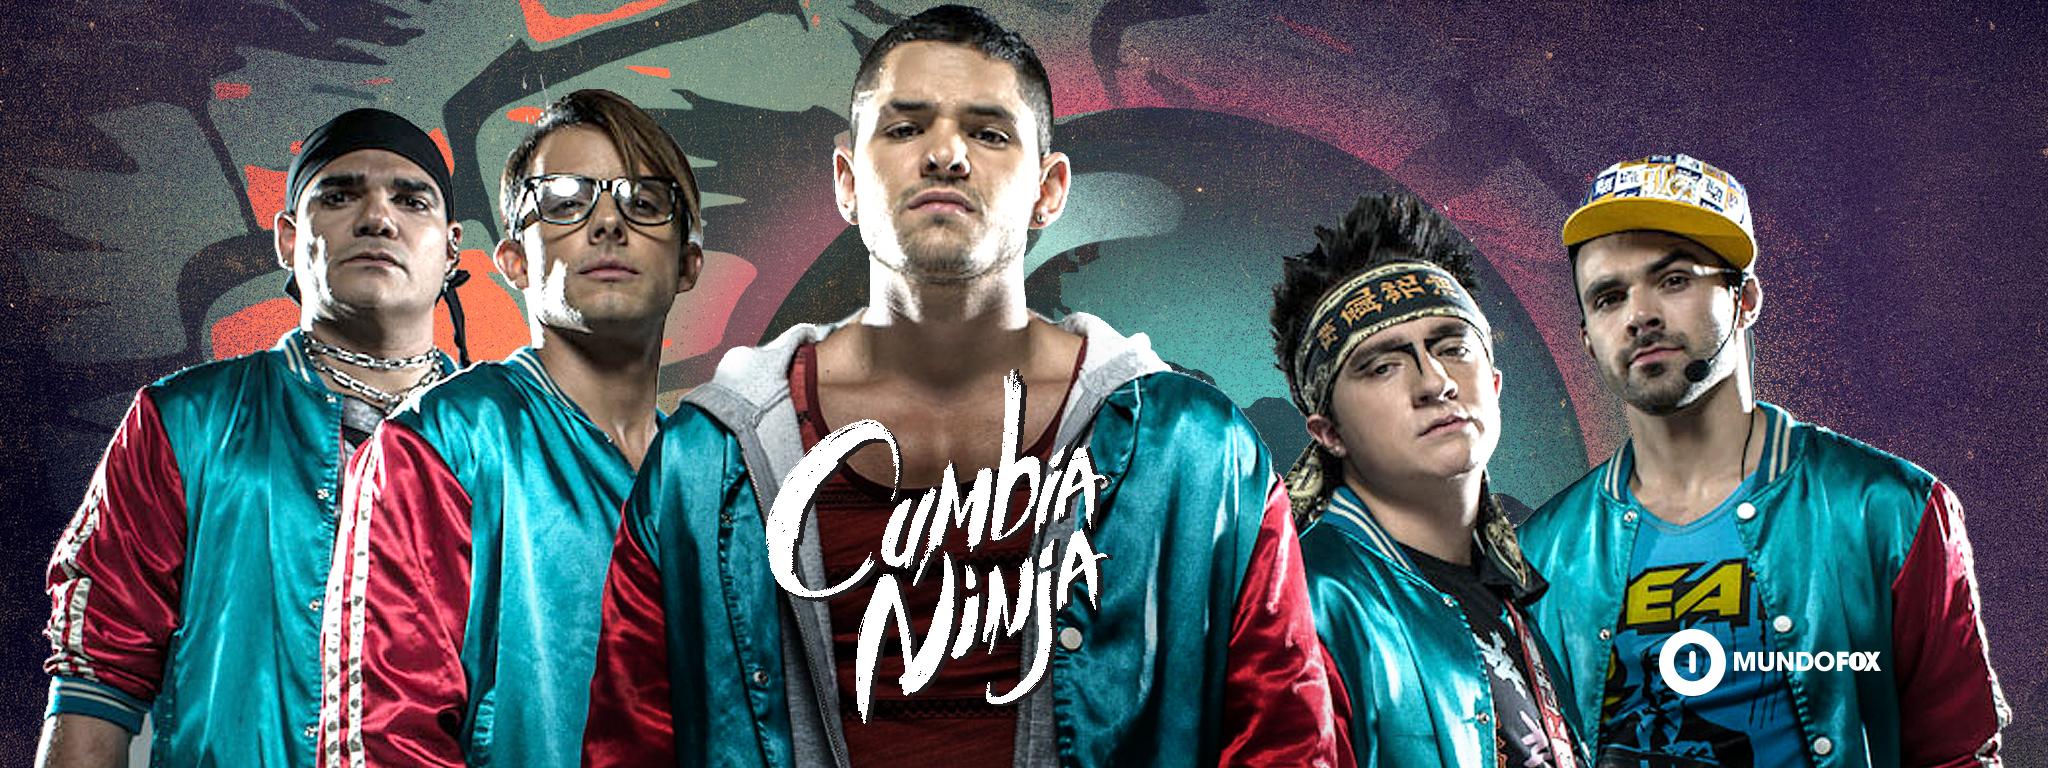 cumbia_ninja